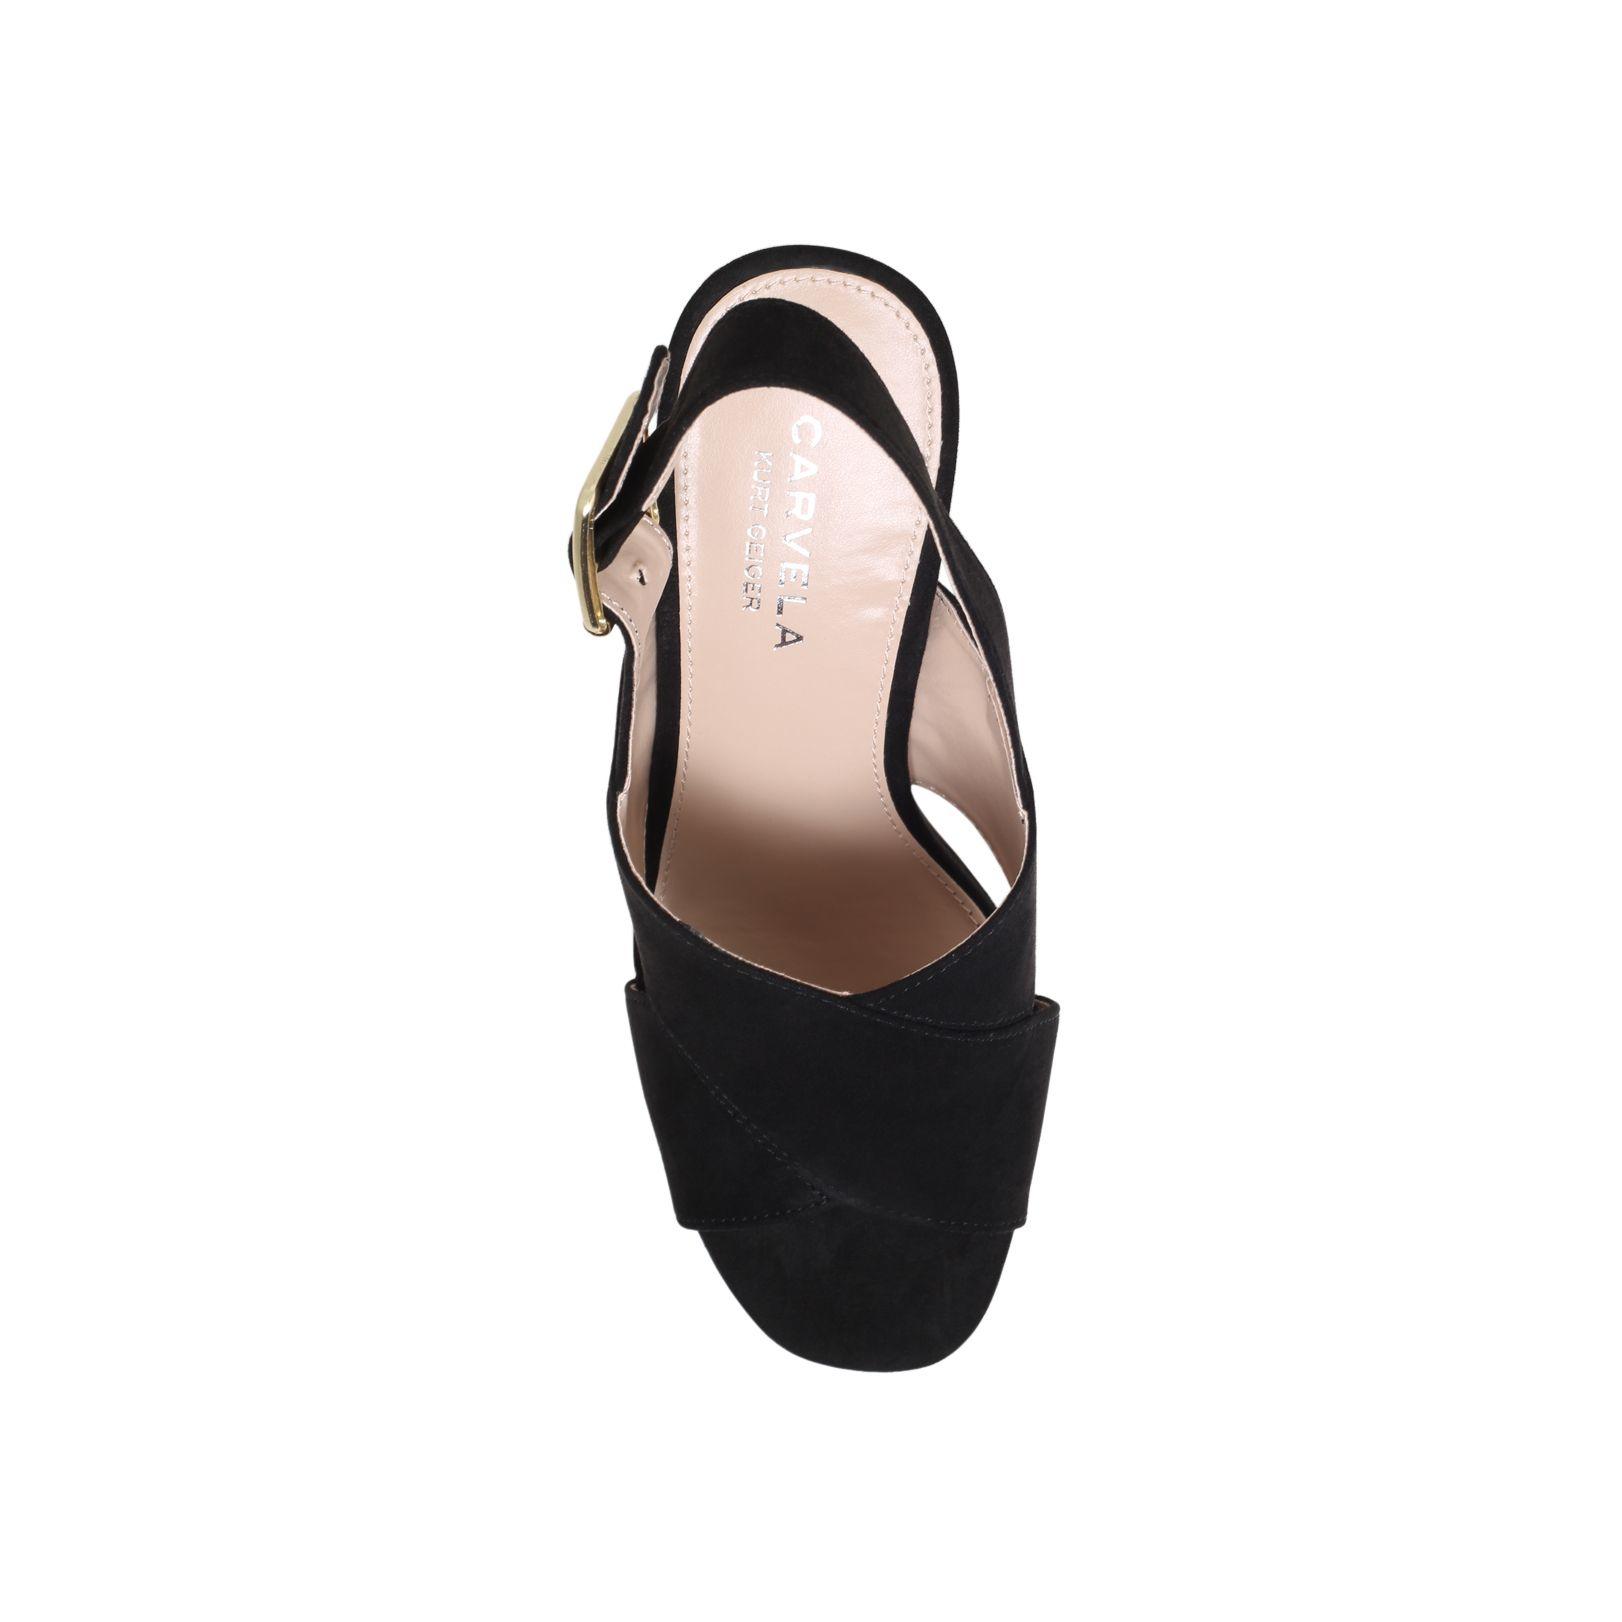 Carvela Serene High Heel Slingback Court Shoes